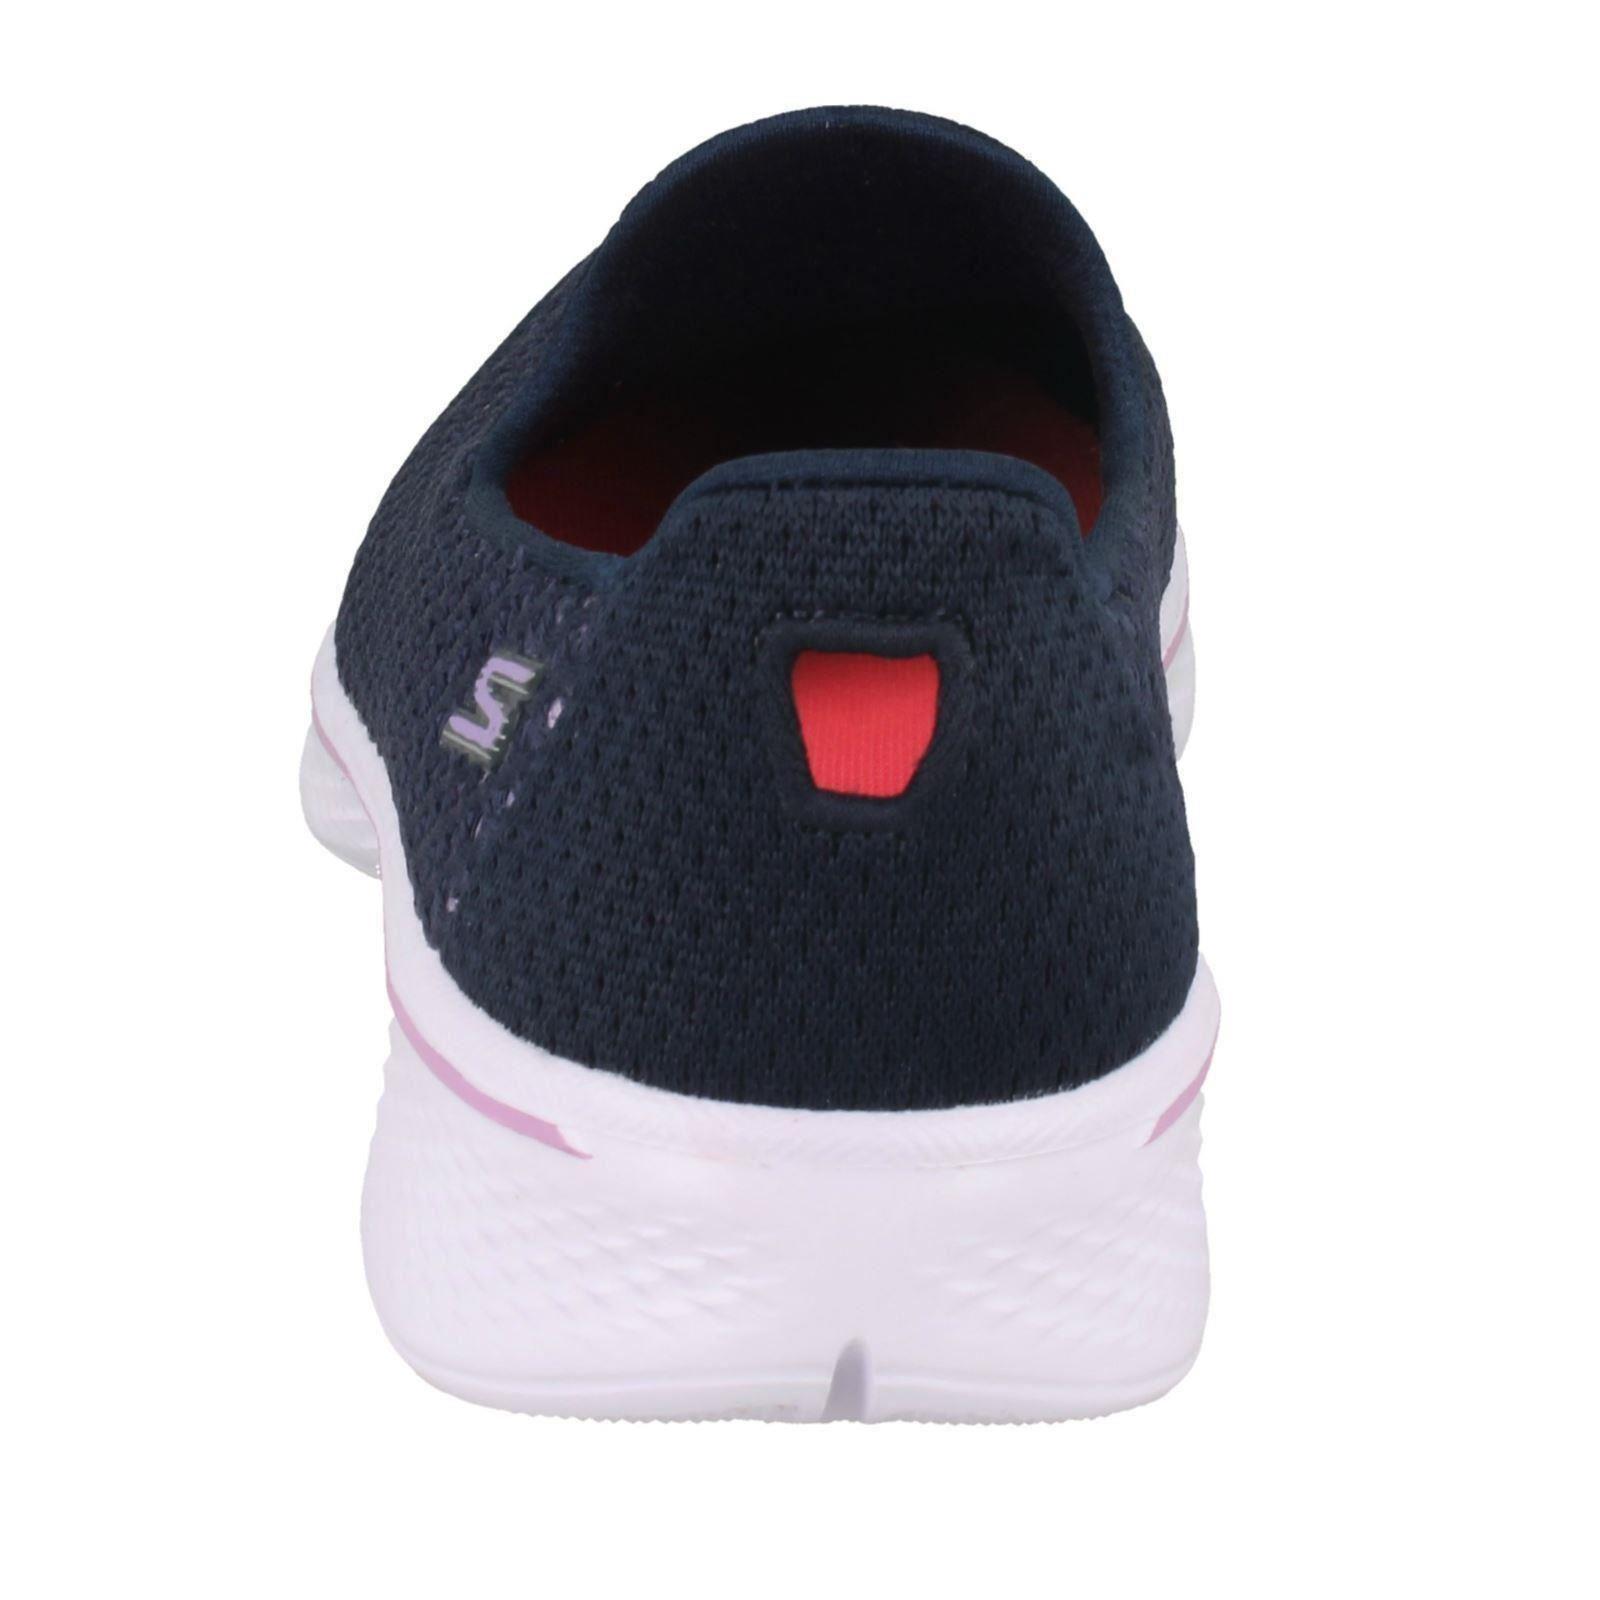 Textile 4 Girls Go Flats 81118 Skechers Kindle Slip Mesh blue On lavender Walk Detail Navy With f04qrf